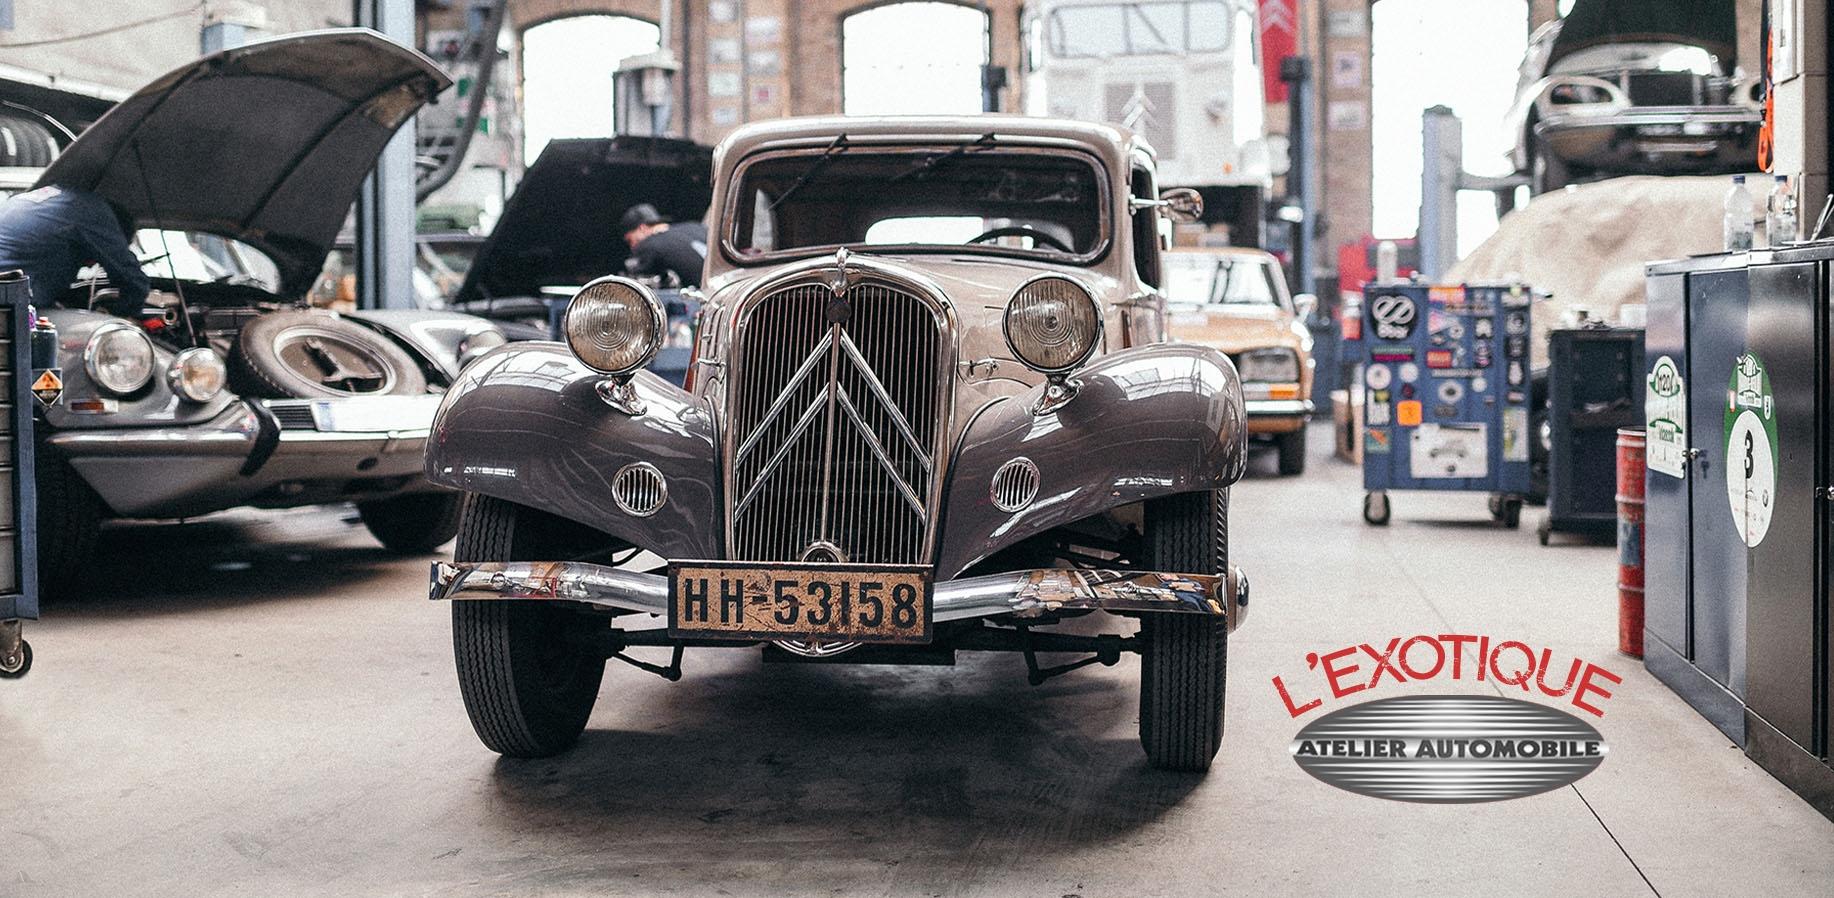 softgarage @ Atelier Automobile